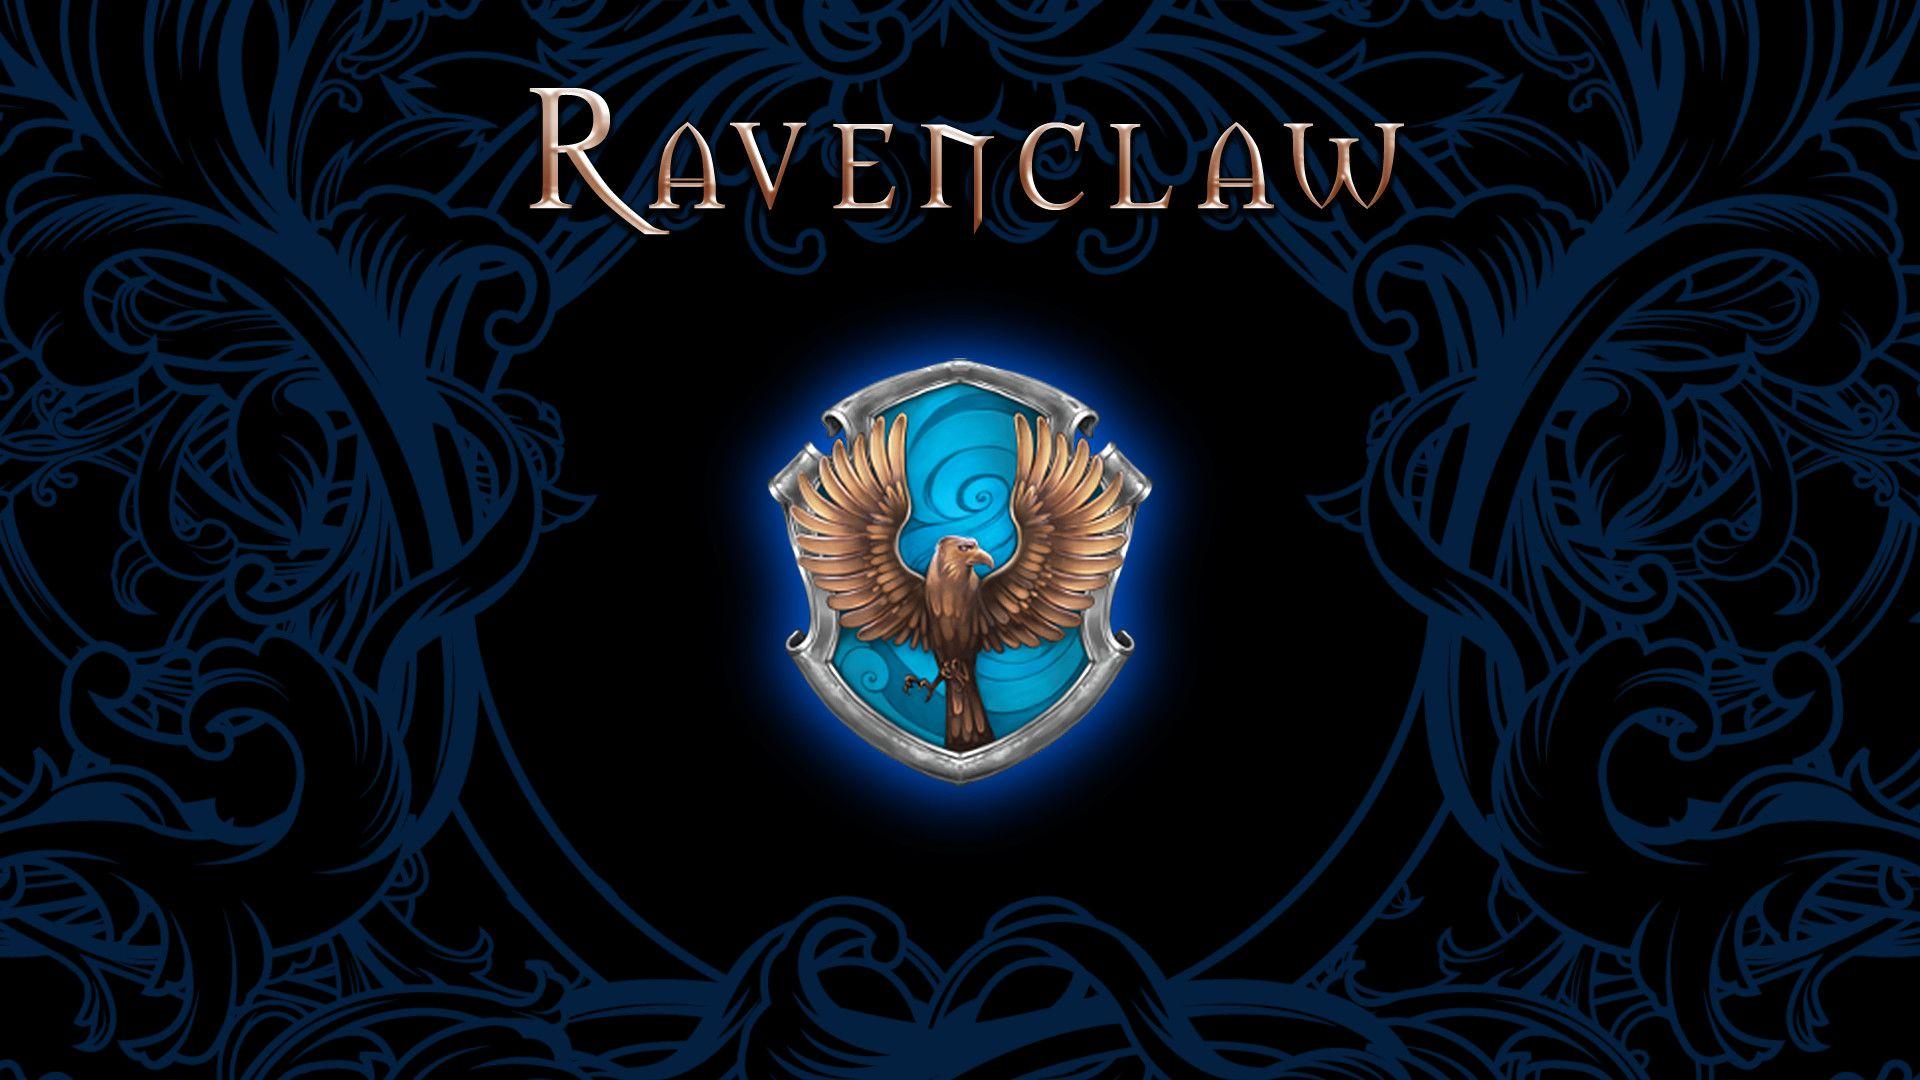 Res 1920x1080 Top1walls Harry Potter Hogwarts Ravenclaw Desktop Bakcgrounds In 2020 Ravenclaw Gifts Ravenclaw Slytherin Wallpaper